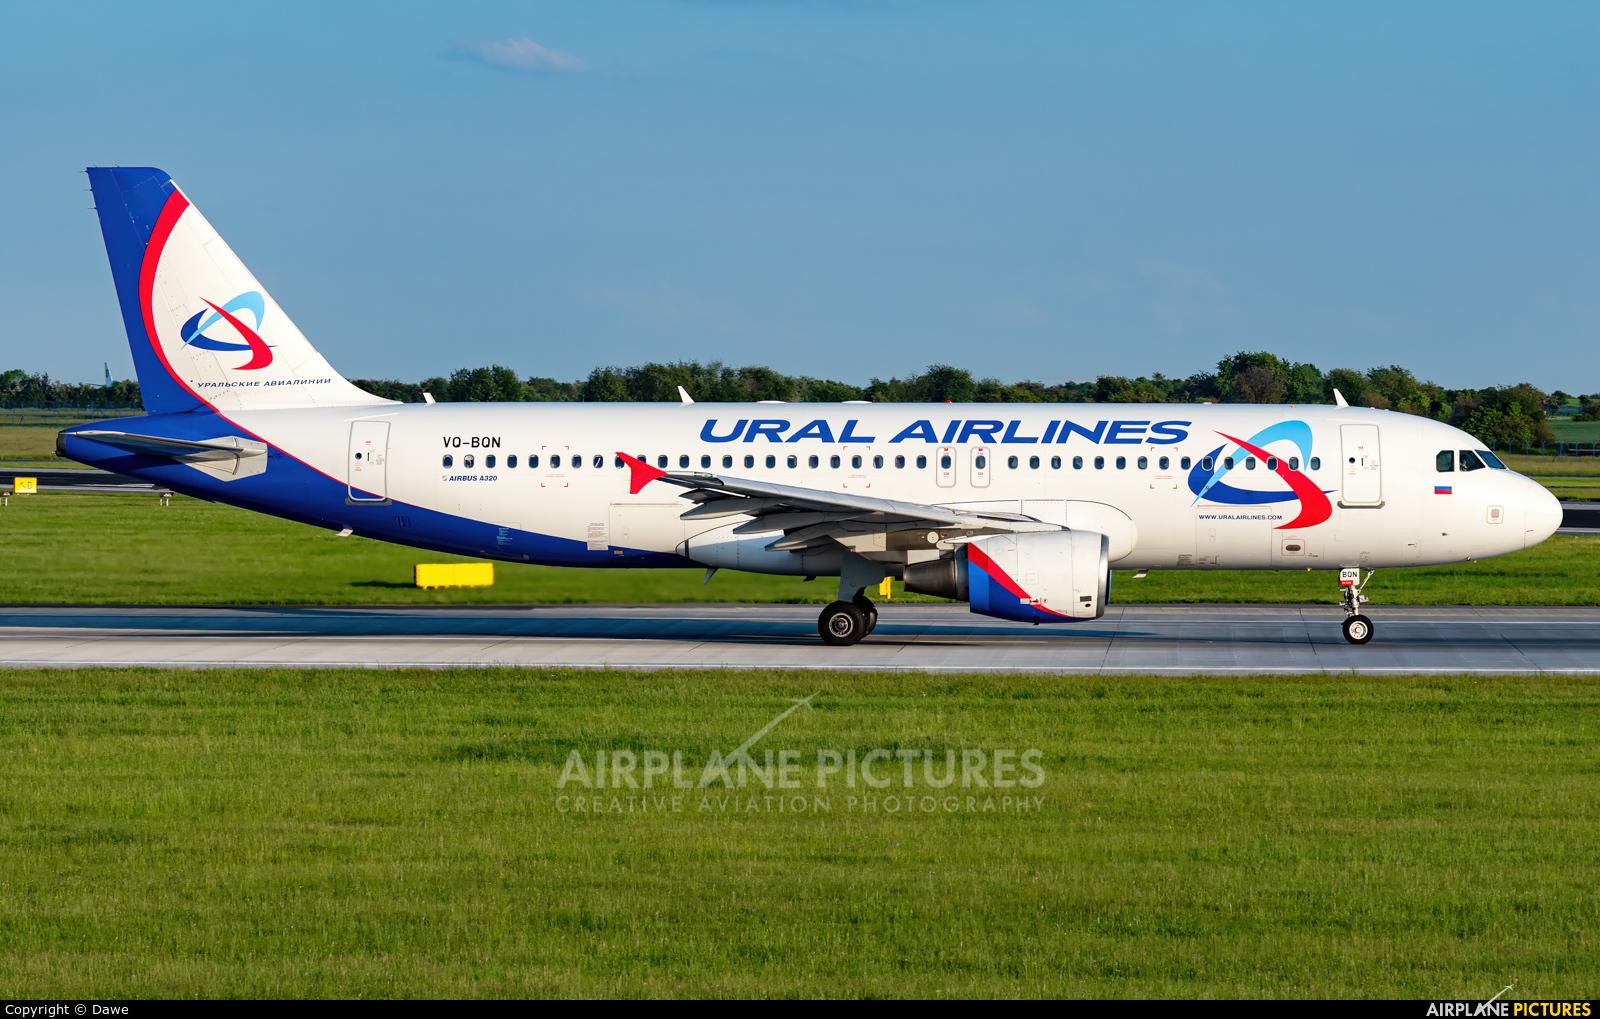 Ural Airlines VQ-BQN aircraft at Prague - Václav Havel